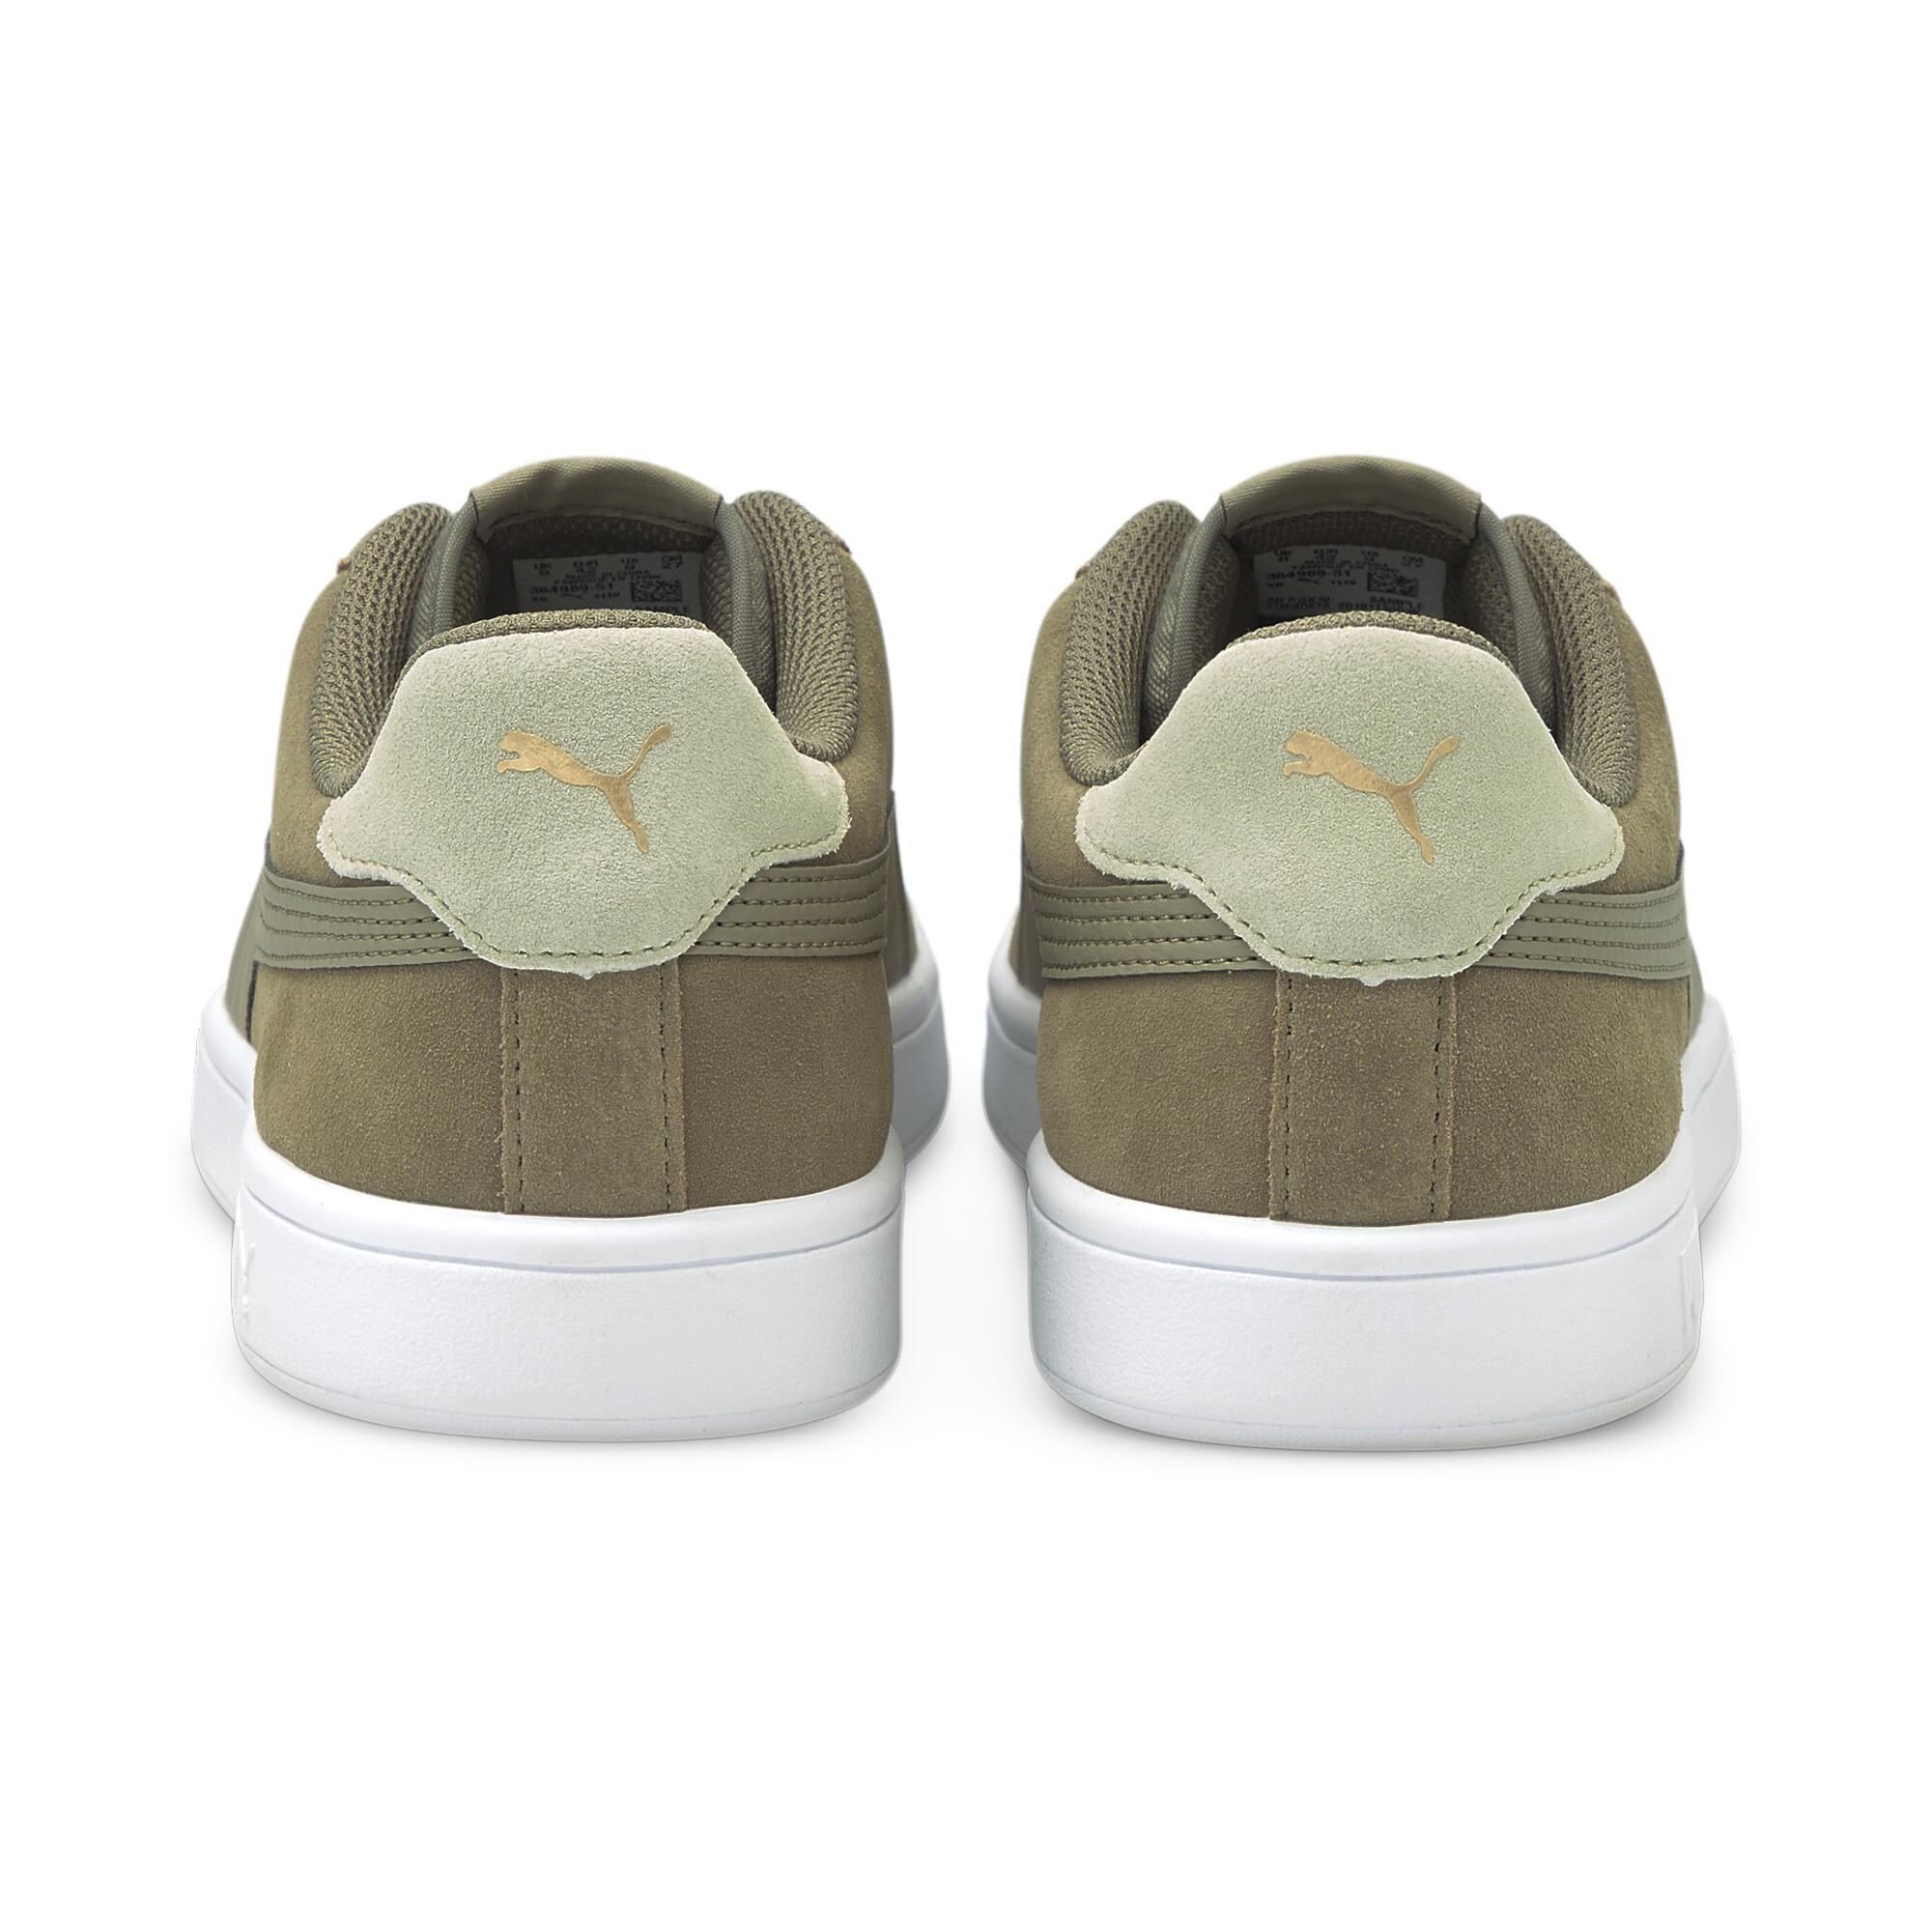 miniature 16 - Puma Men's Smash v2 Sneakers